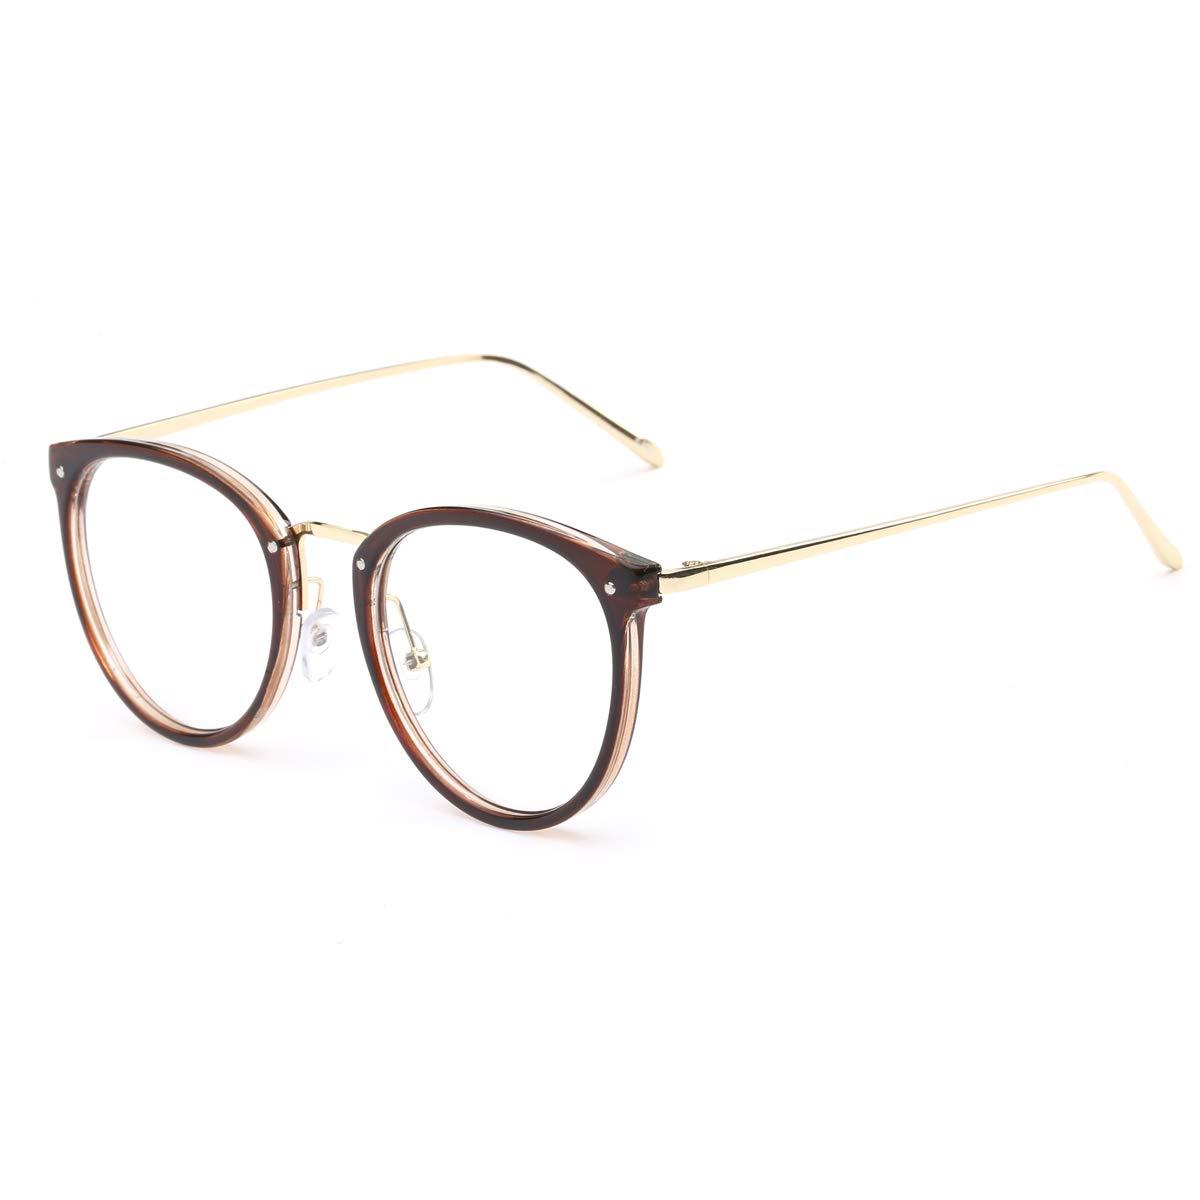 f1fa7a4389a Details about AISSWZBER Vintage Round Women Eyewear Metal Optical Frame  Clear Non-prescription